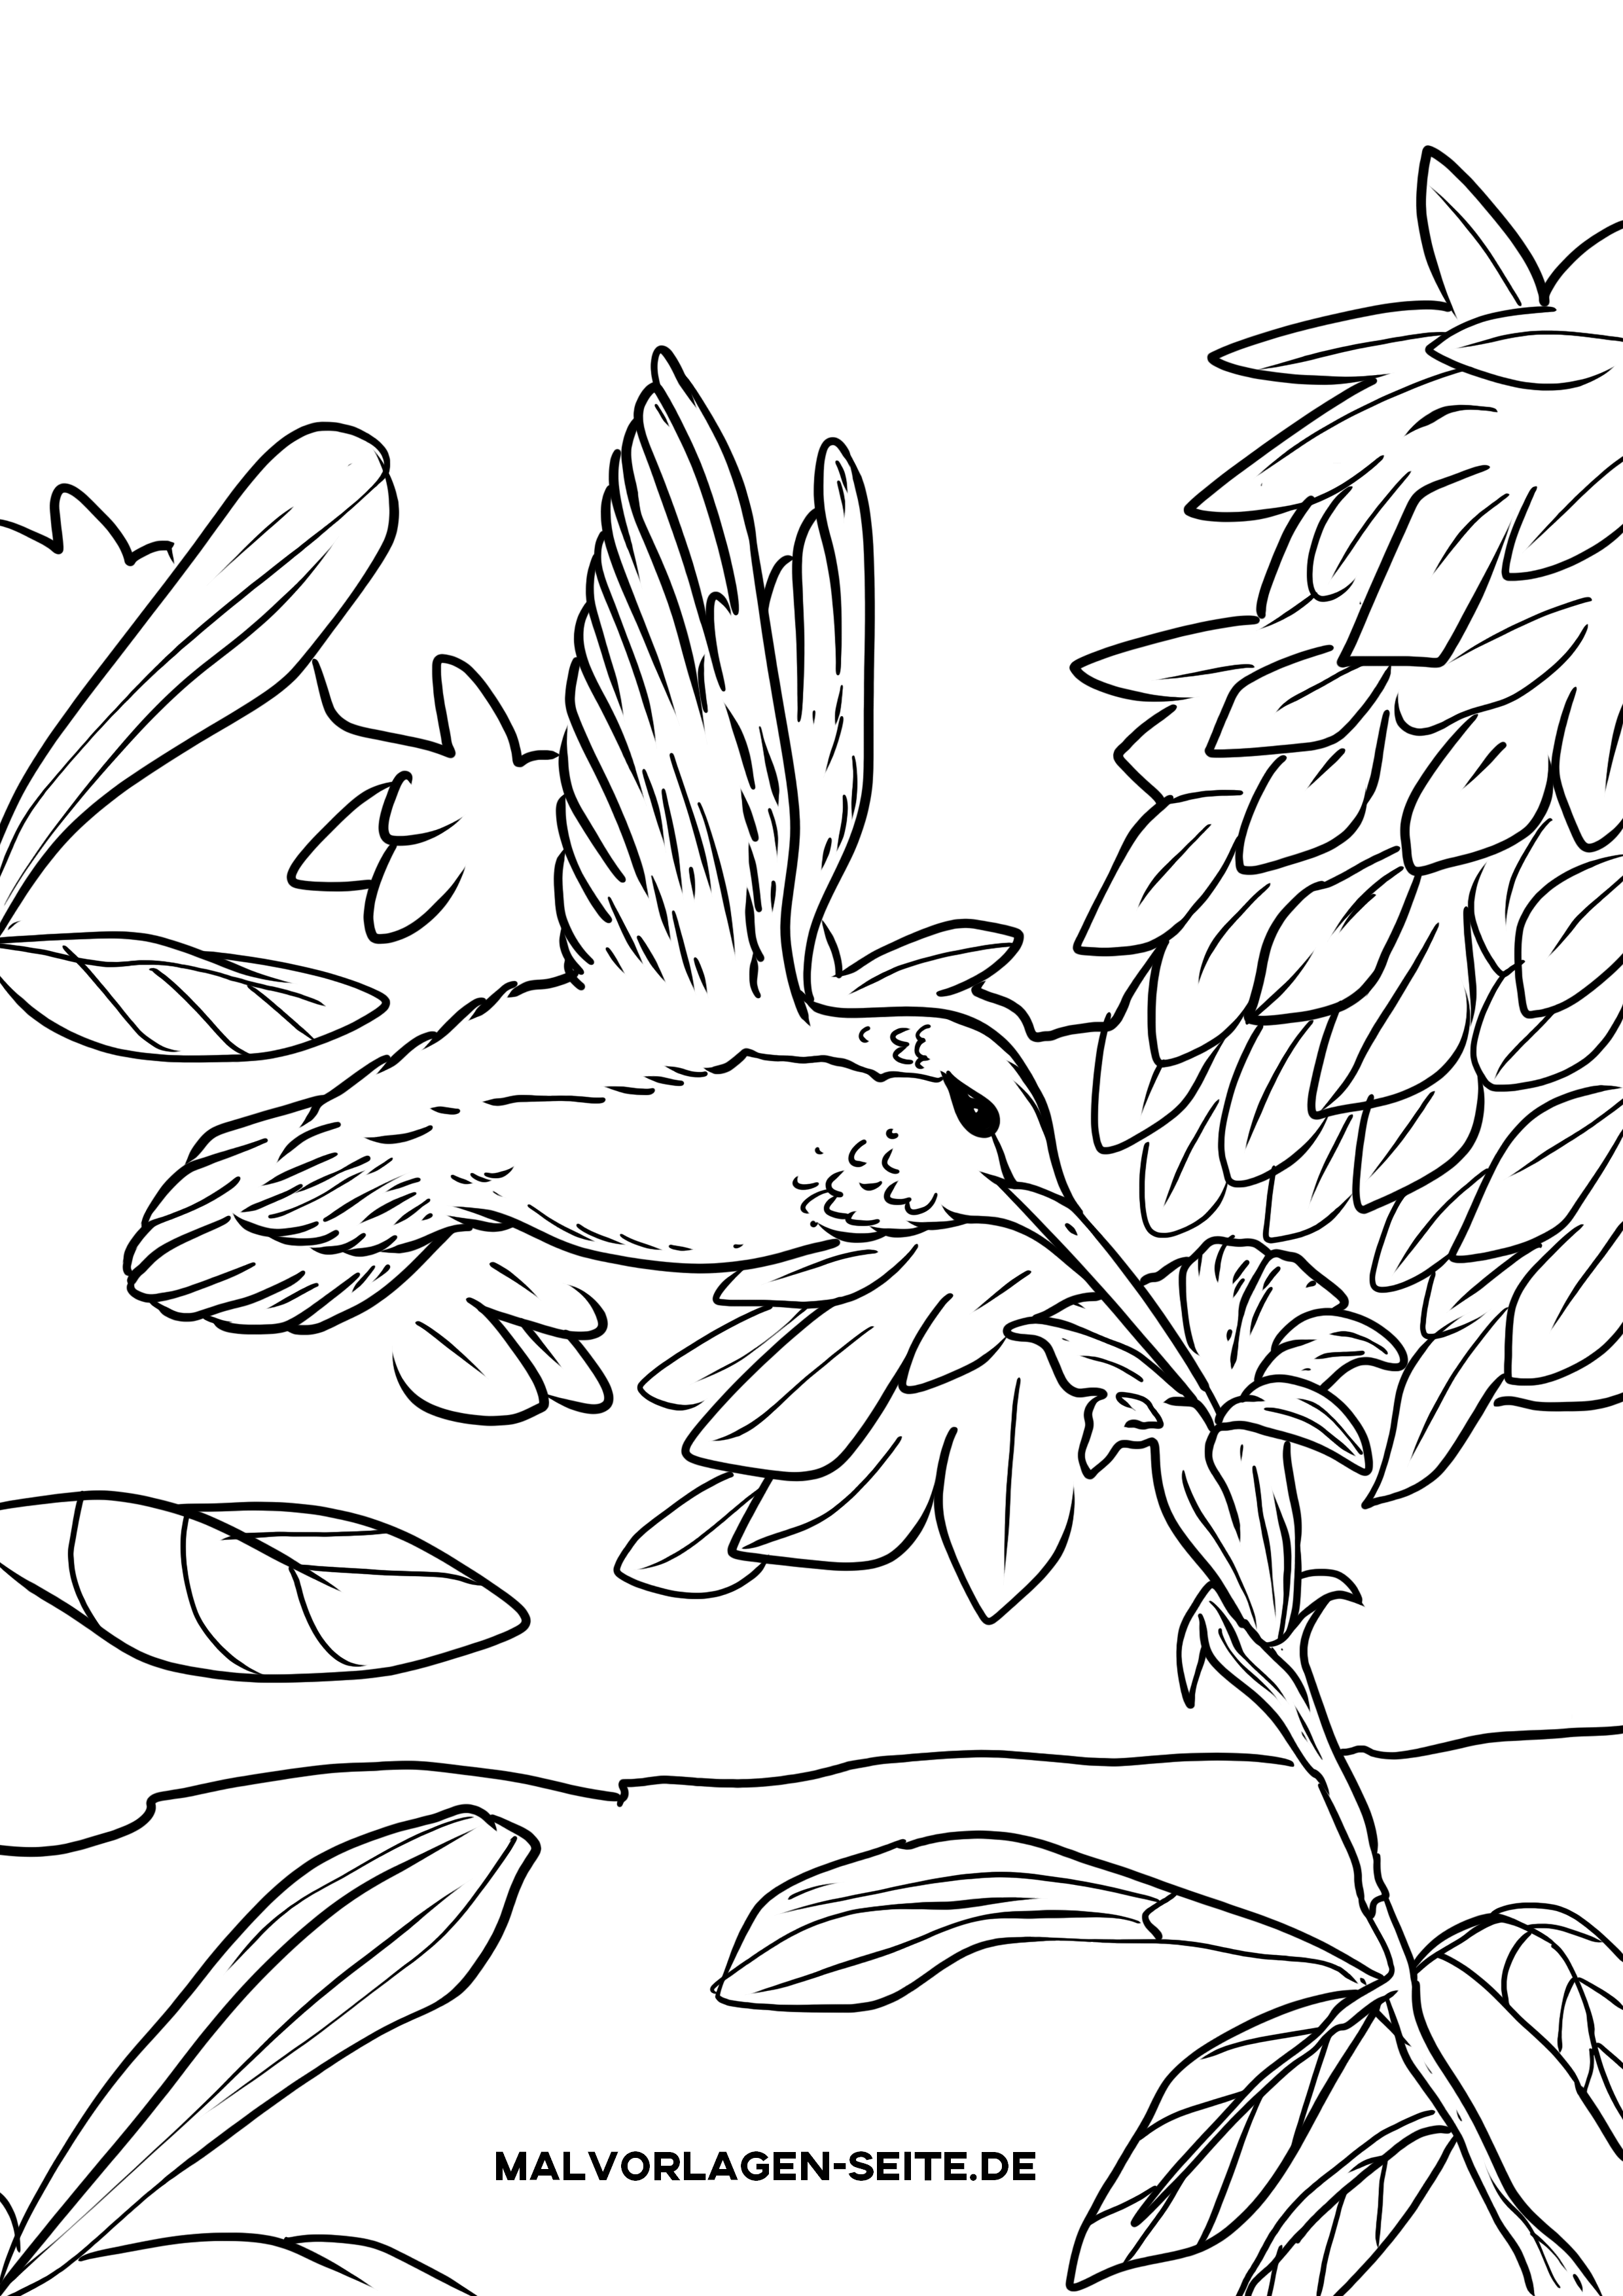 Malvorlage Kolibri  Vögel Tiere - Kostenlose Ausmalbilder